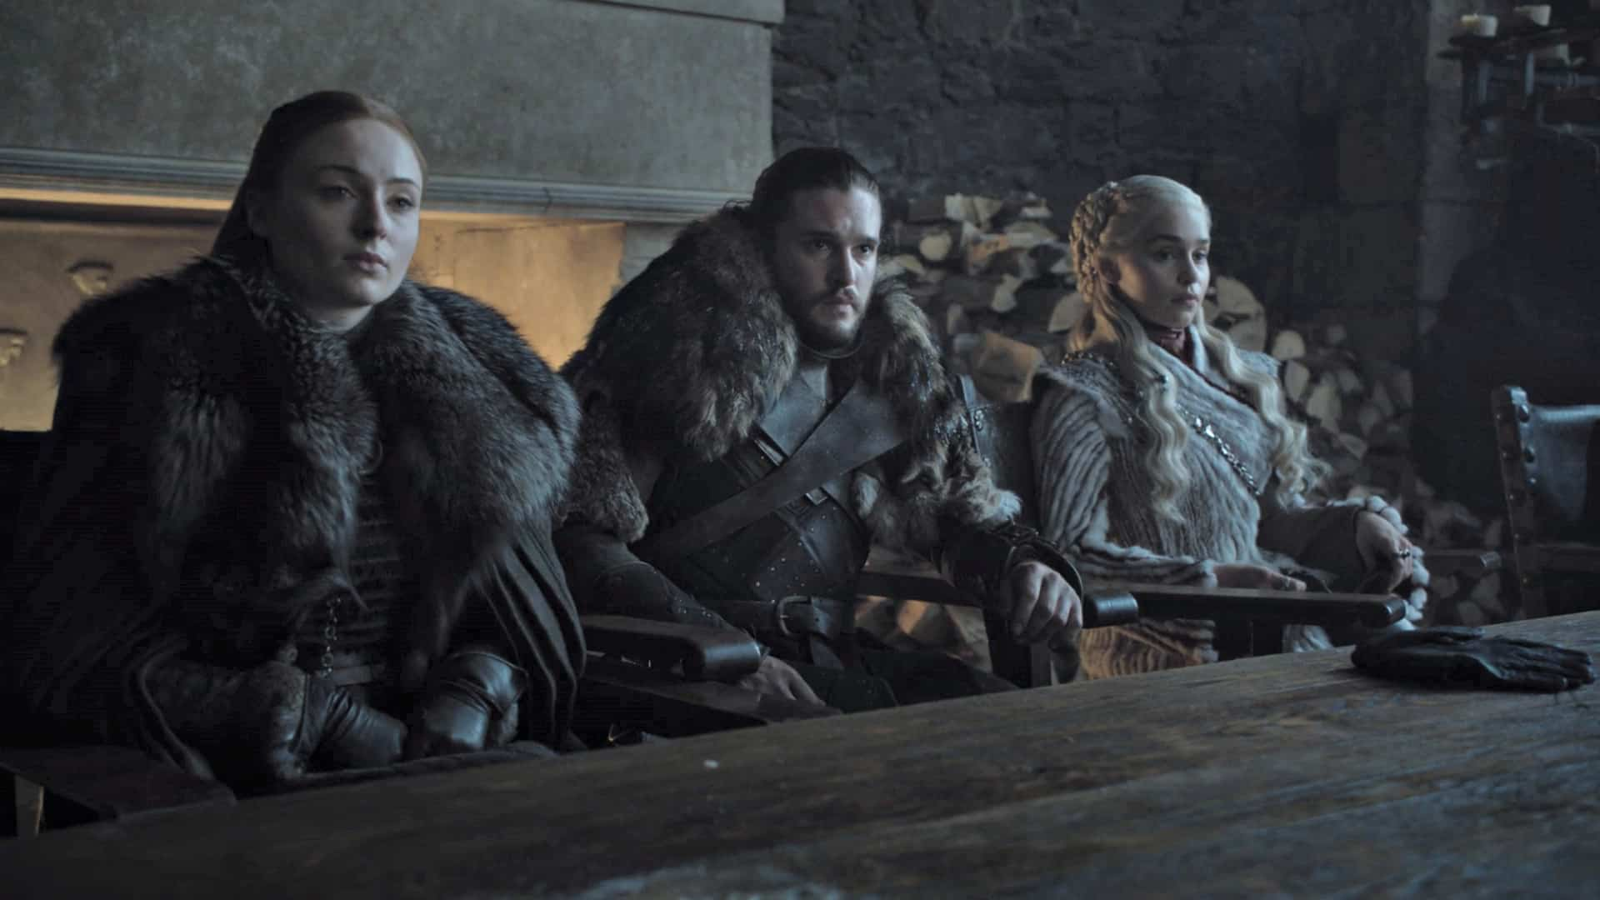 Game of Thrones Season 8: Winterfell Recap